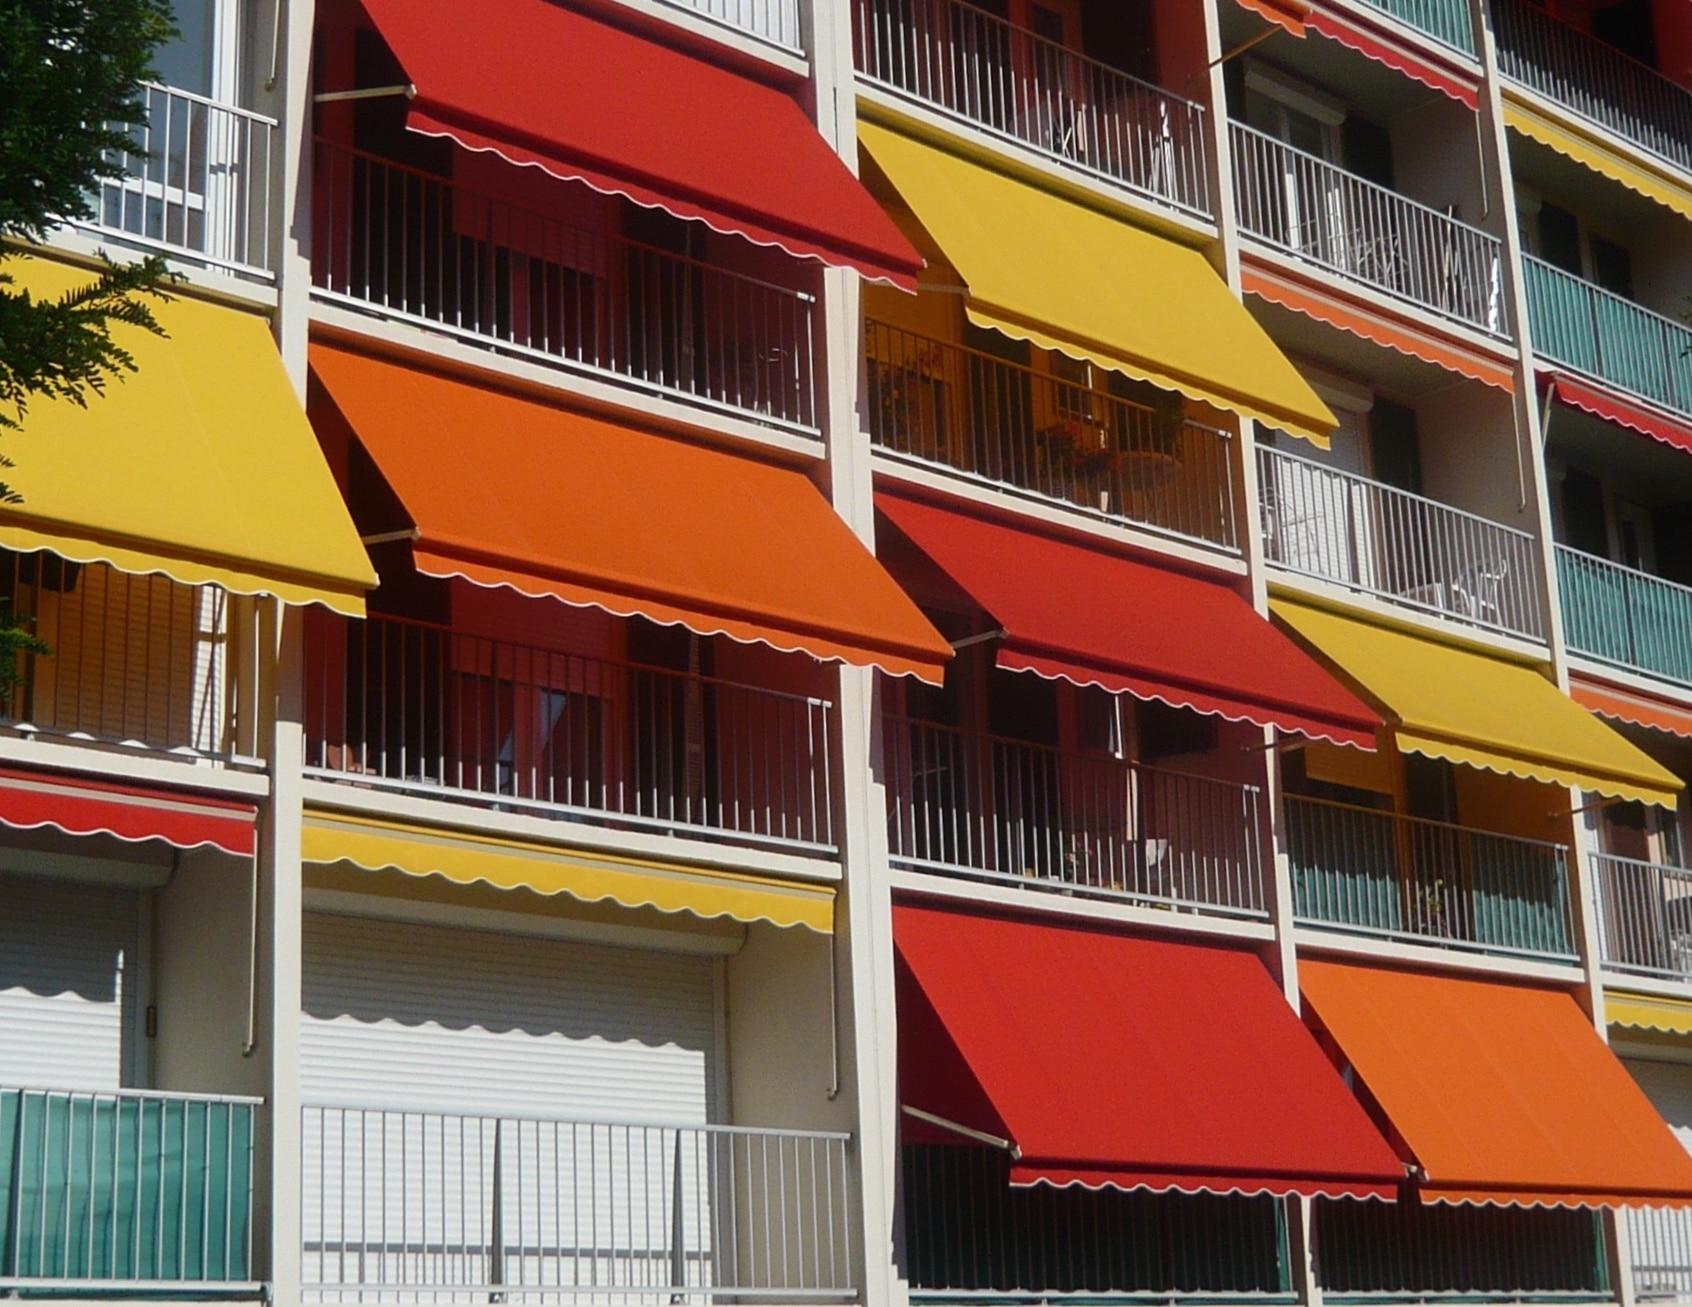 Store de balcon - Store bannette - Weisz